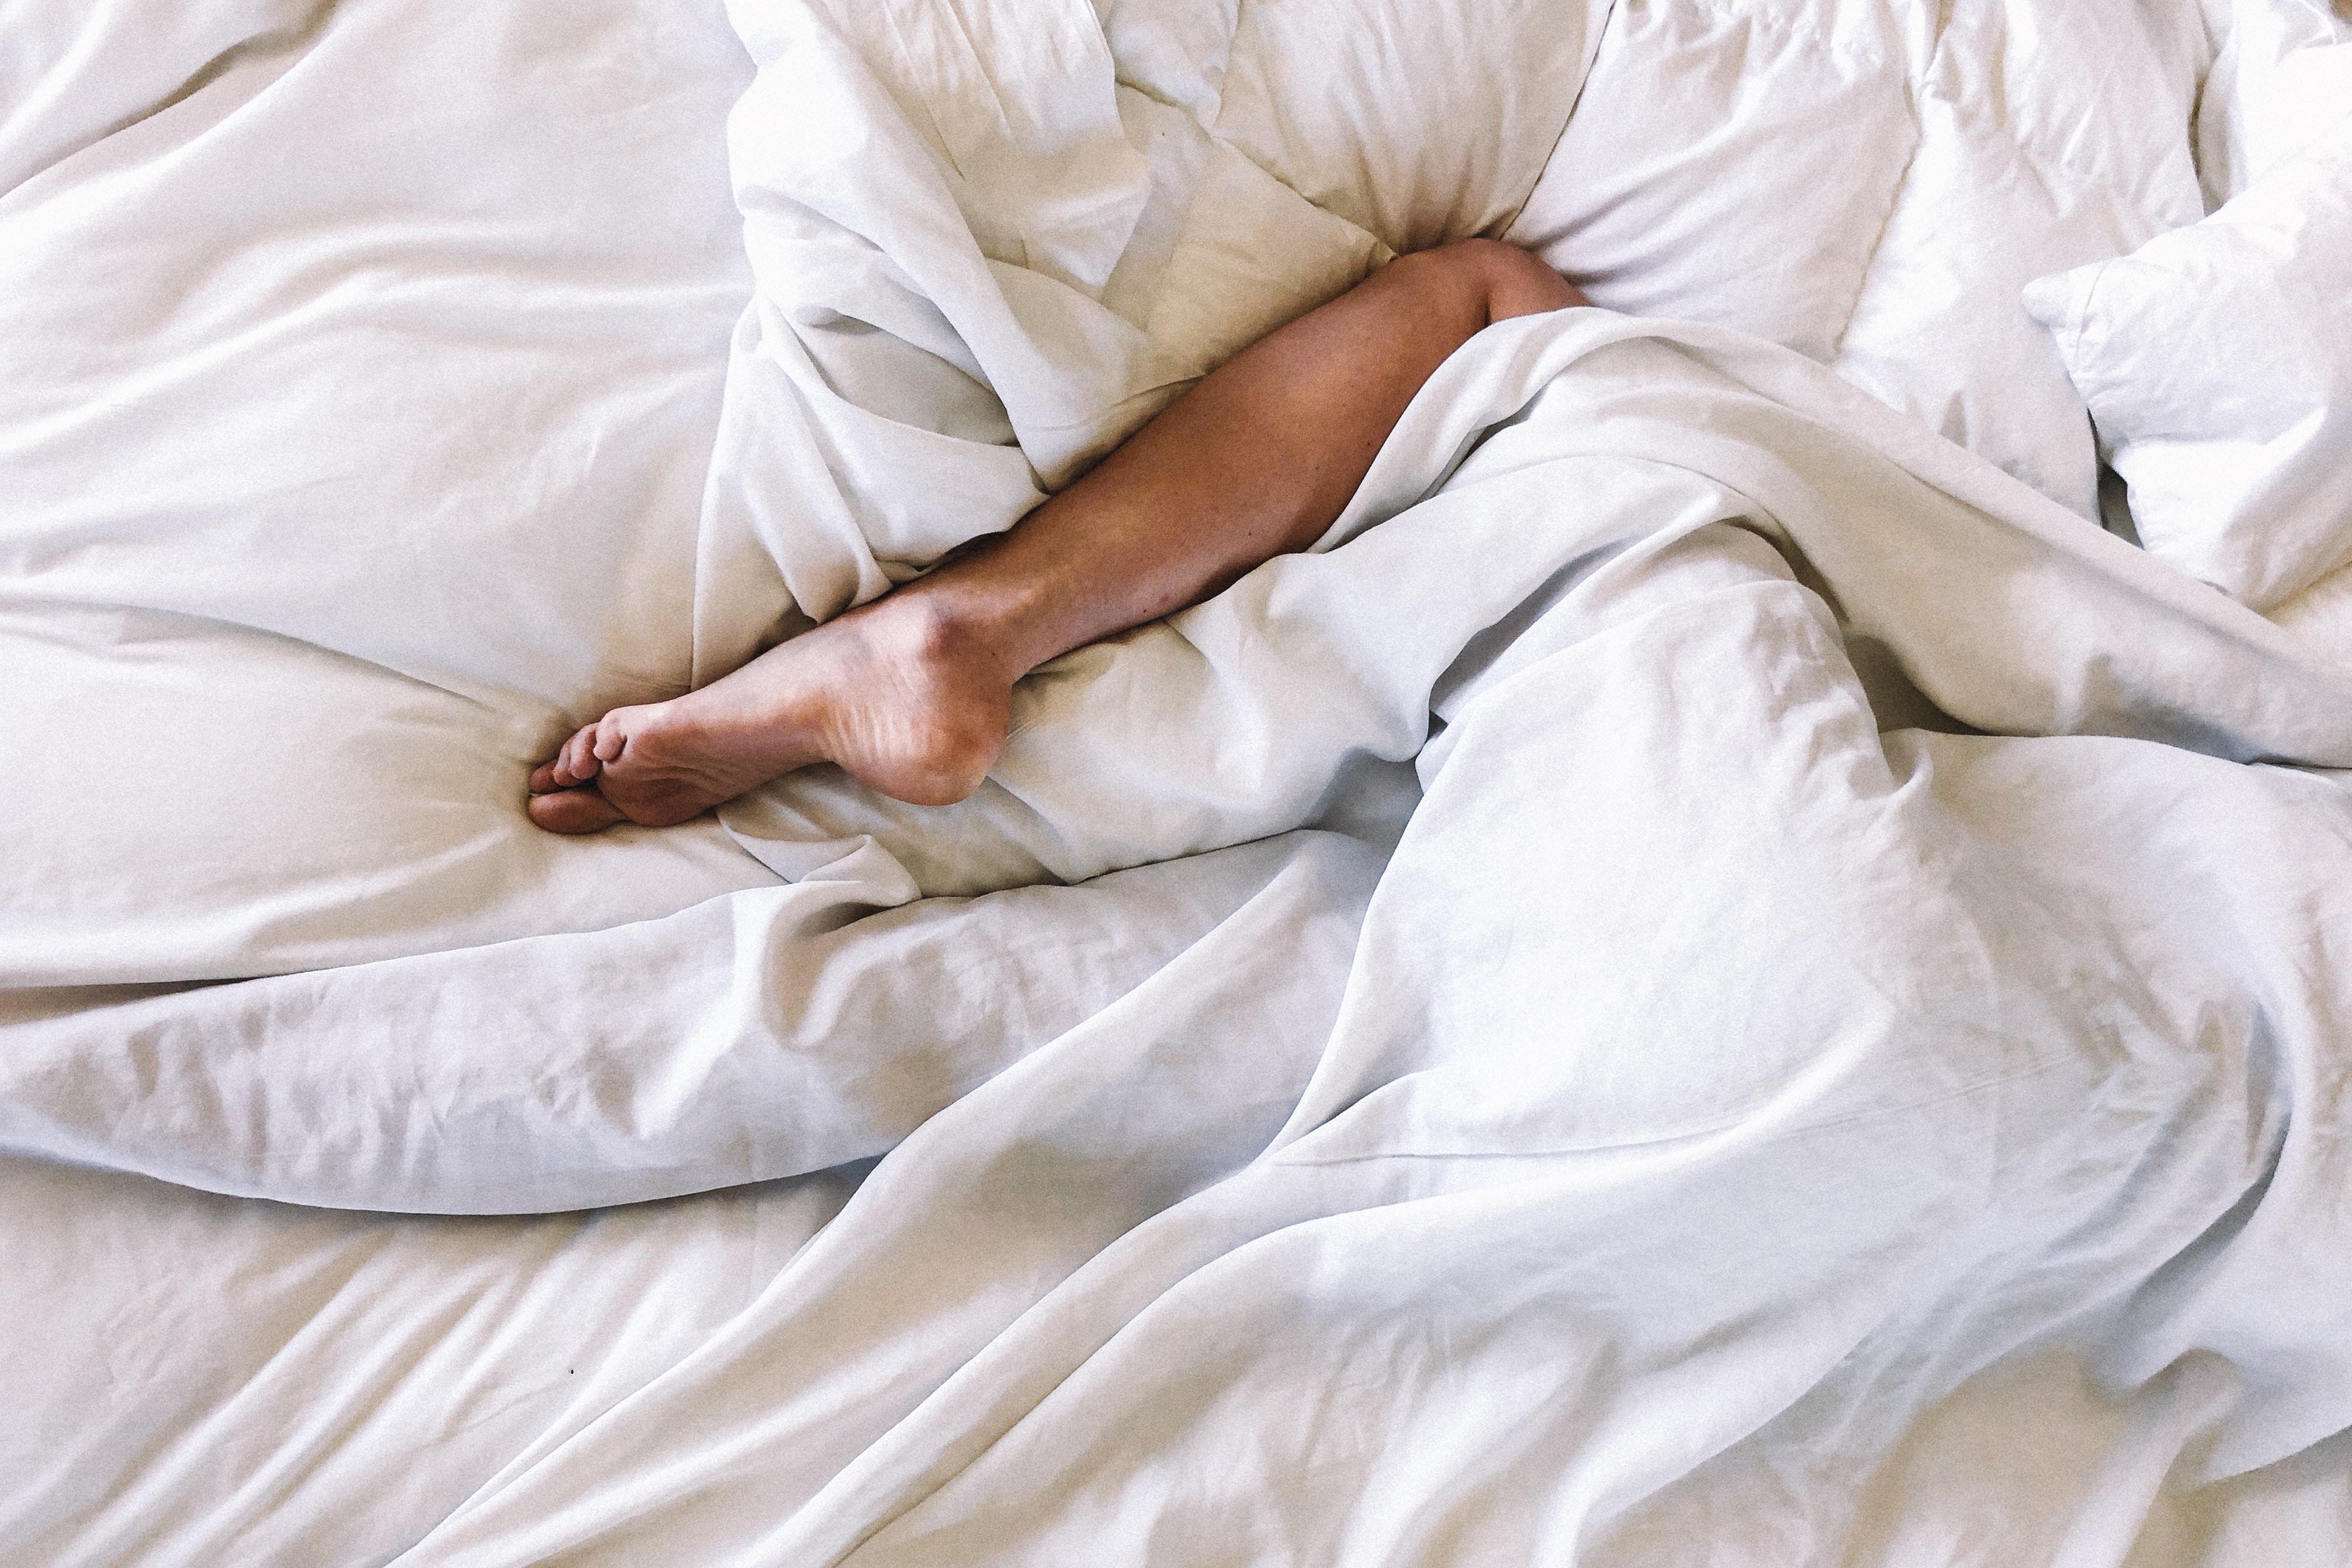 Does Hypothyroidism Cause Night Sweats?